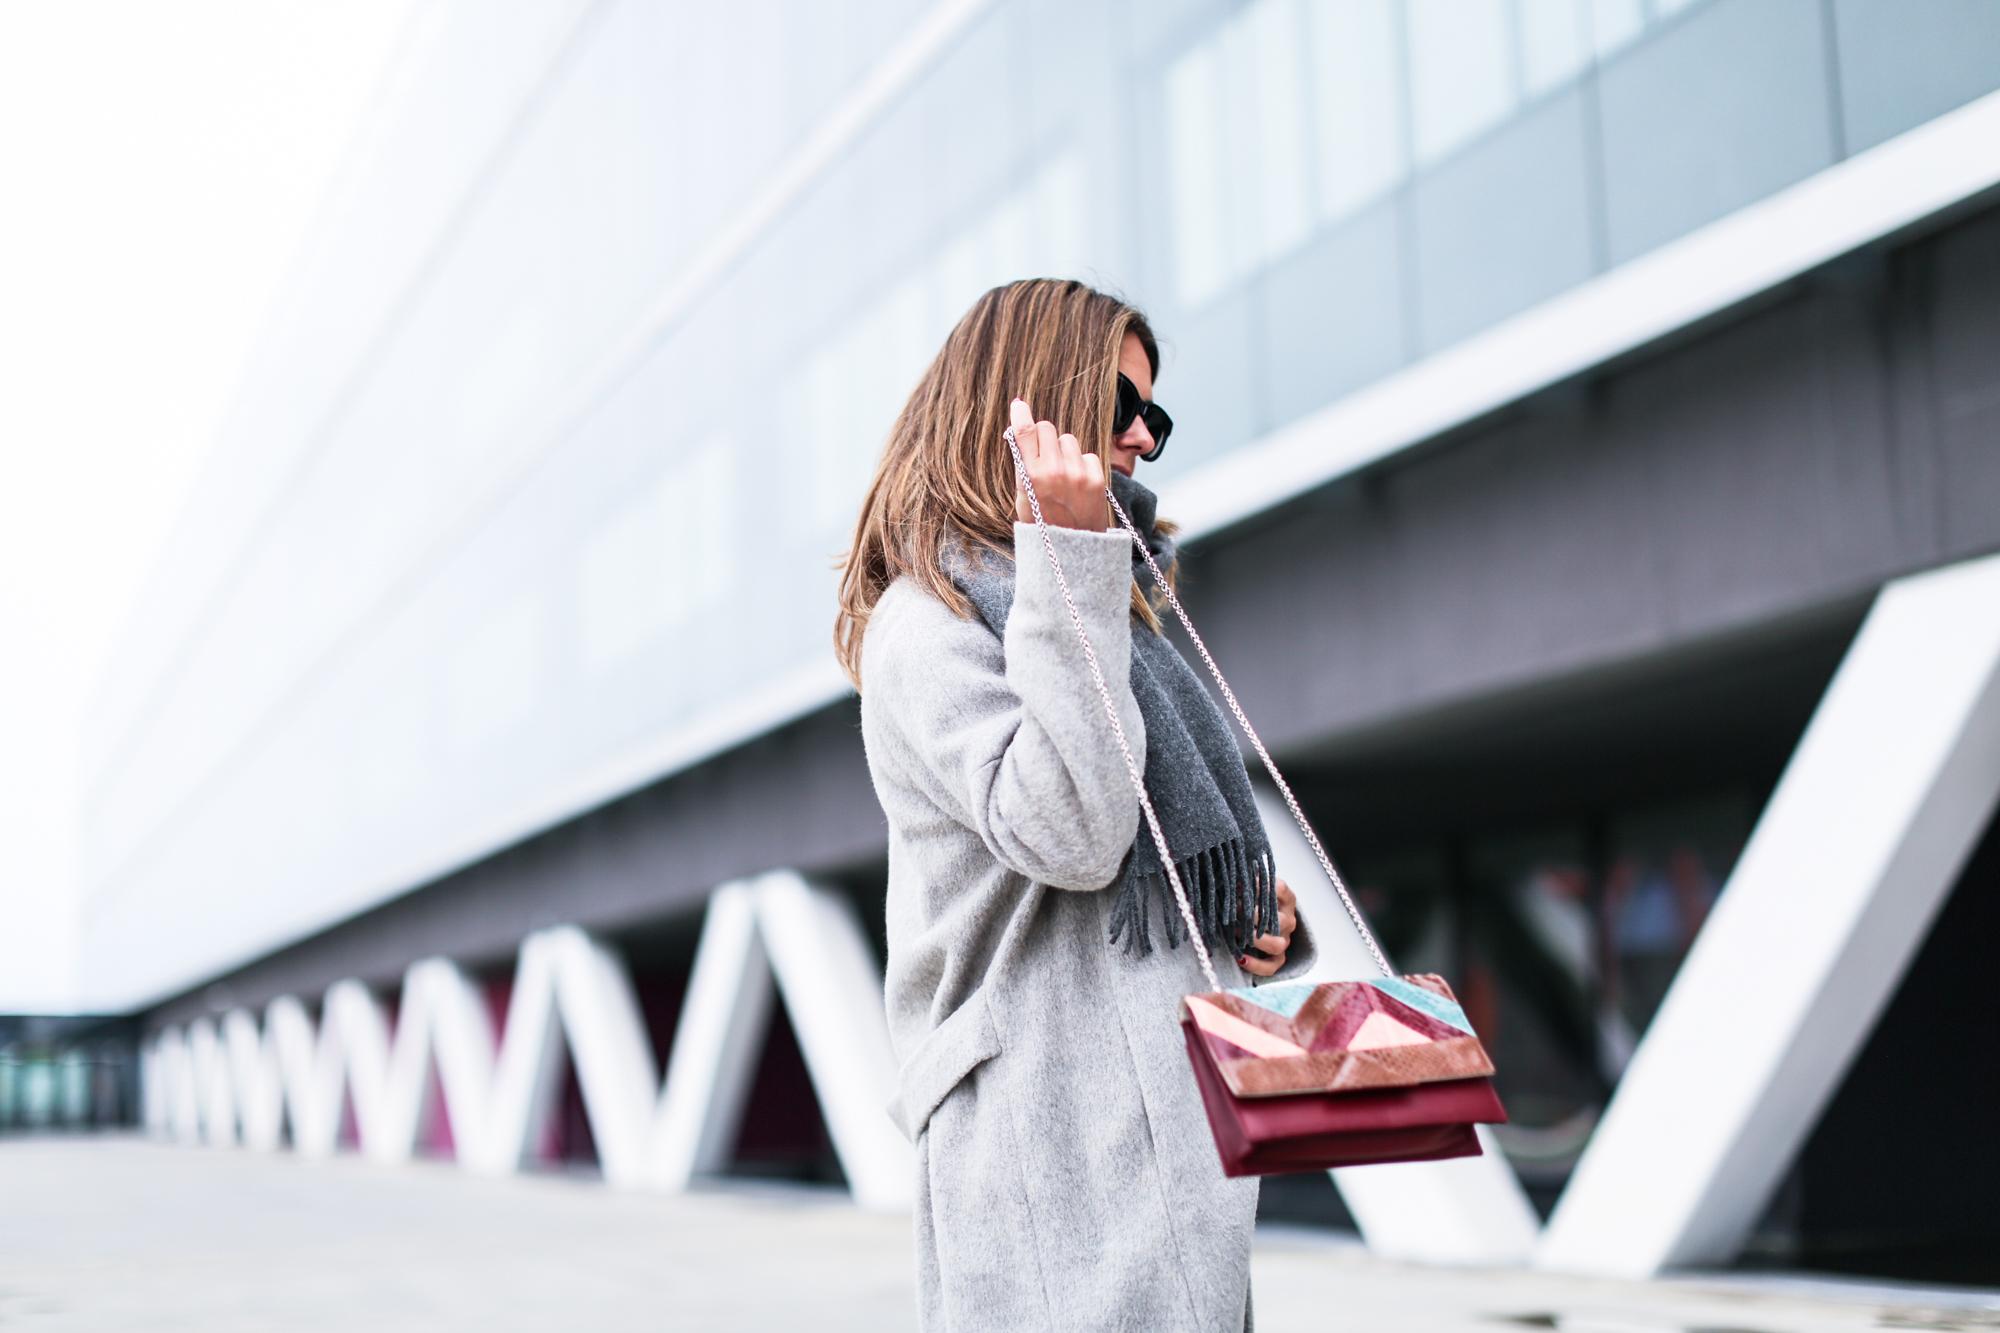 Clochet_streetstyle_fashionblogger_abrigolargogrislanamango_isabelmarantdicker_sudaderalazoclaudiepierlot-5